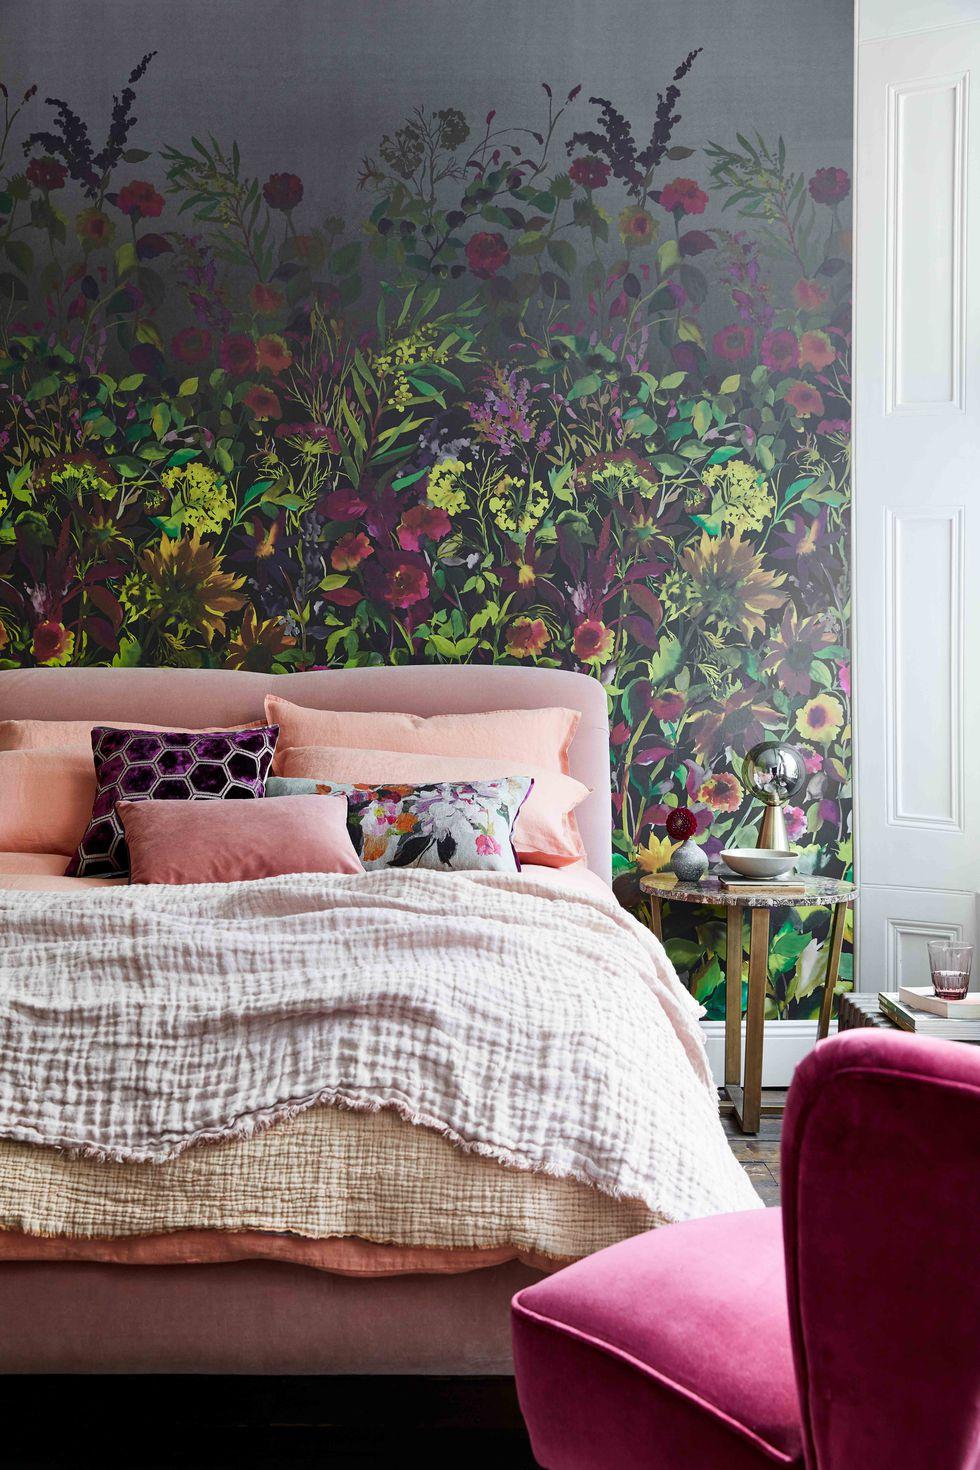 preciosas ideas de decoración de dormitorios de matrimonio modernos, paredes papel pintado con motivos florales